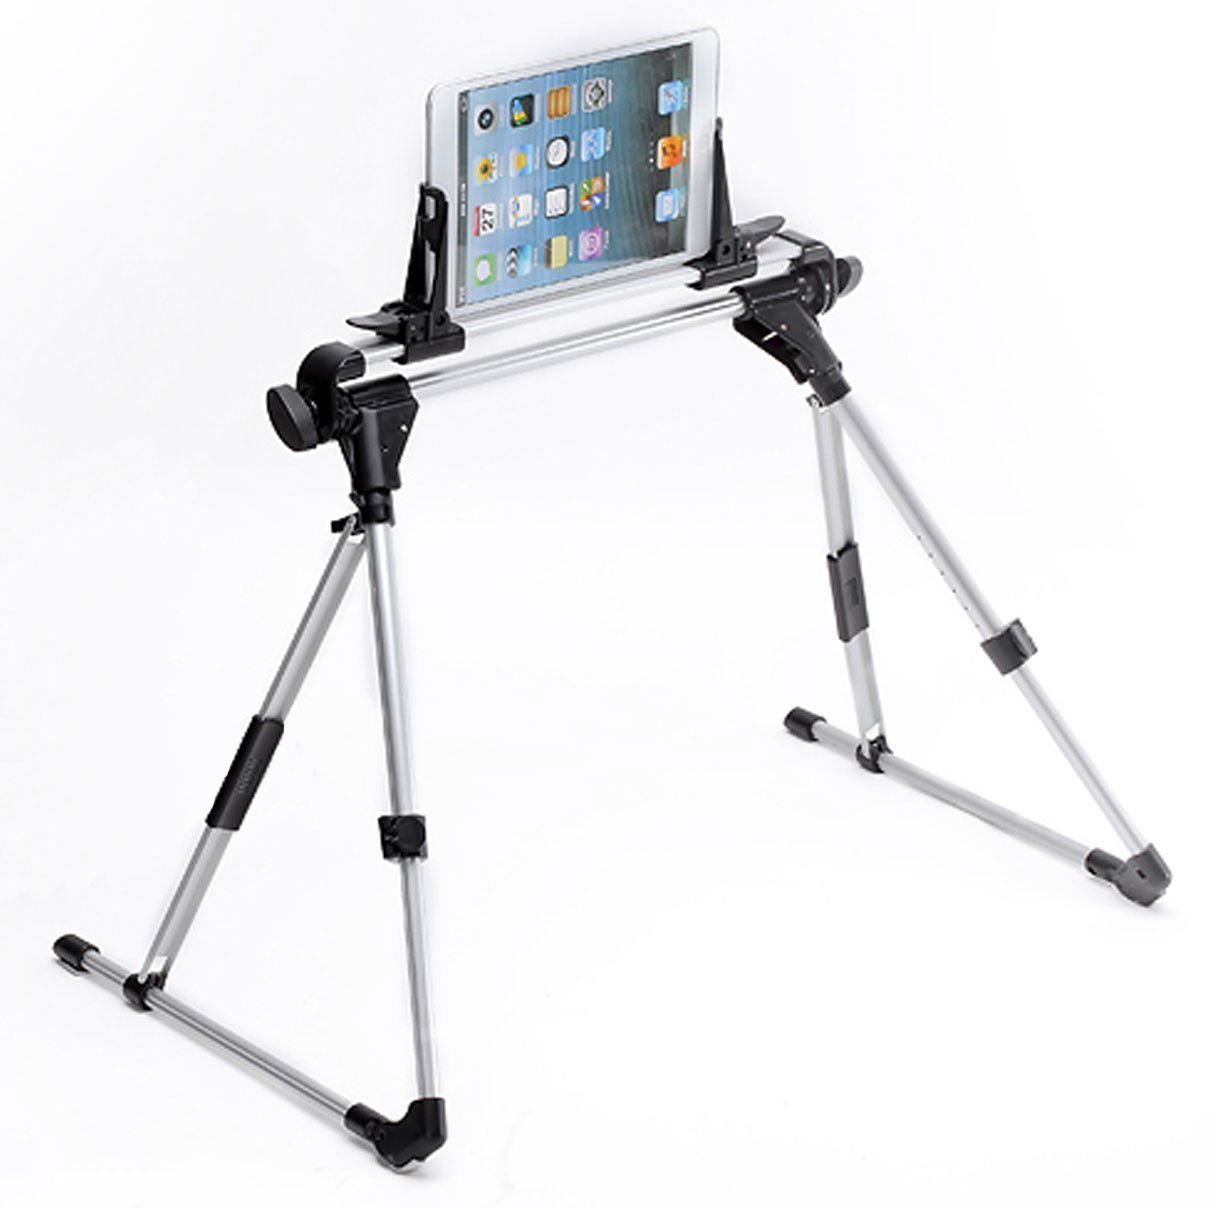 Betterhill Tablet Bed Frame Adjustable Tablet Holder Stand for iPad 1/2/3/4,iPad 5/iPad Air,iPad Air2/iPad6,iPhone,Samsung Galaxy Tab,Huawei MediaPad,Google Nexus,Blackberry Playbook,Microsoft Surface